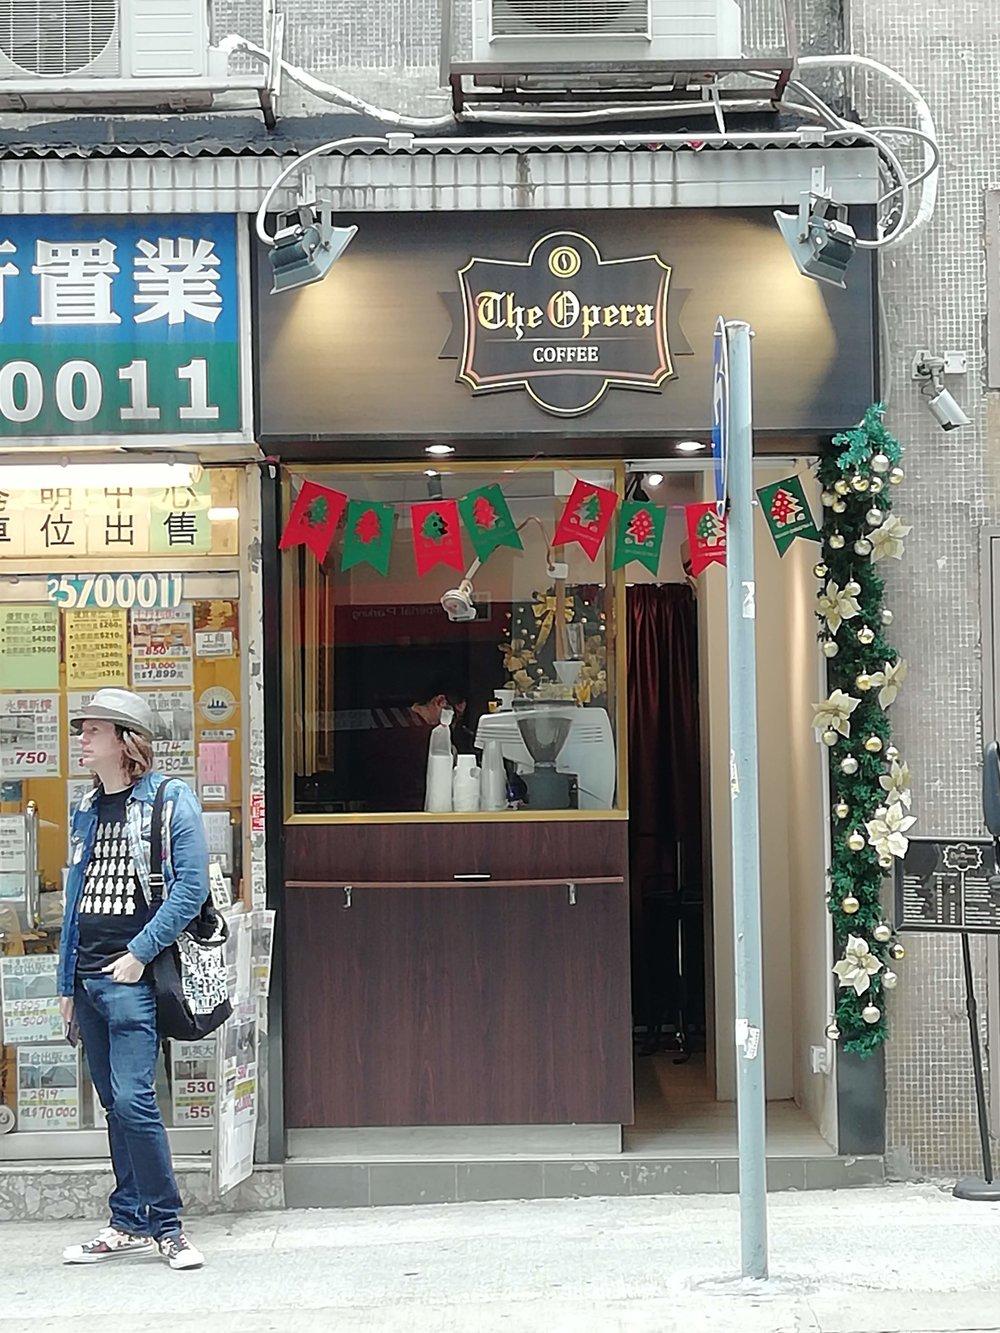 Opera Coffee House